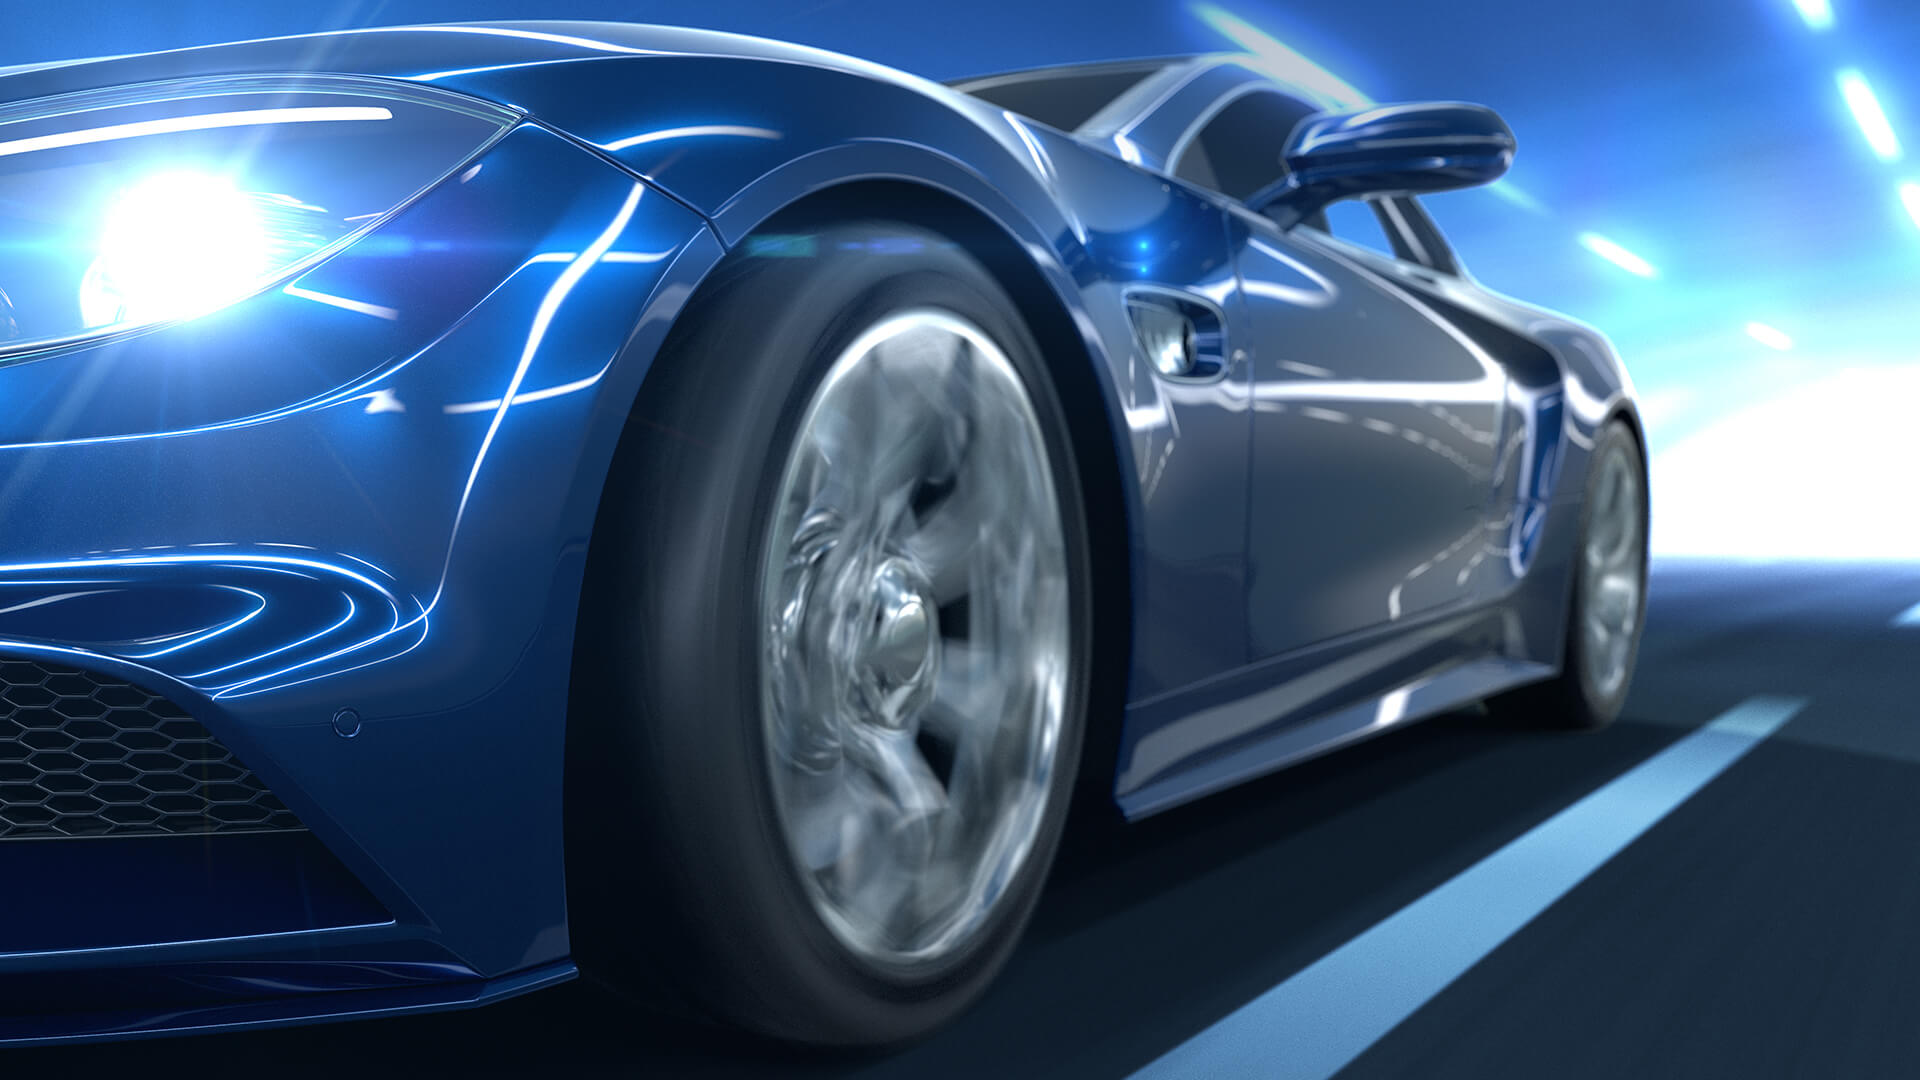 BYK Automotive Coatings